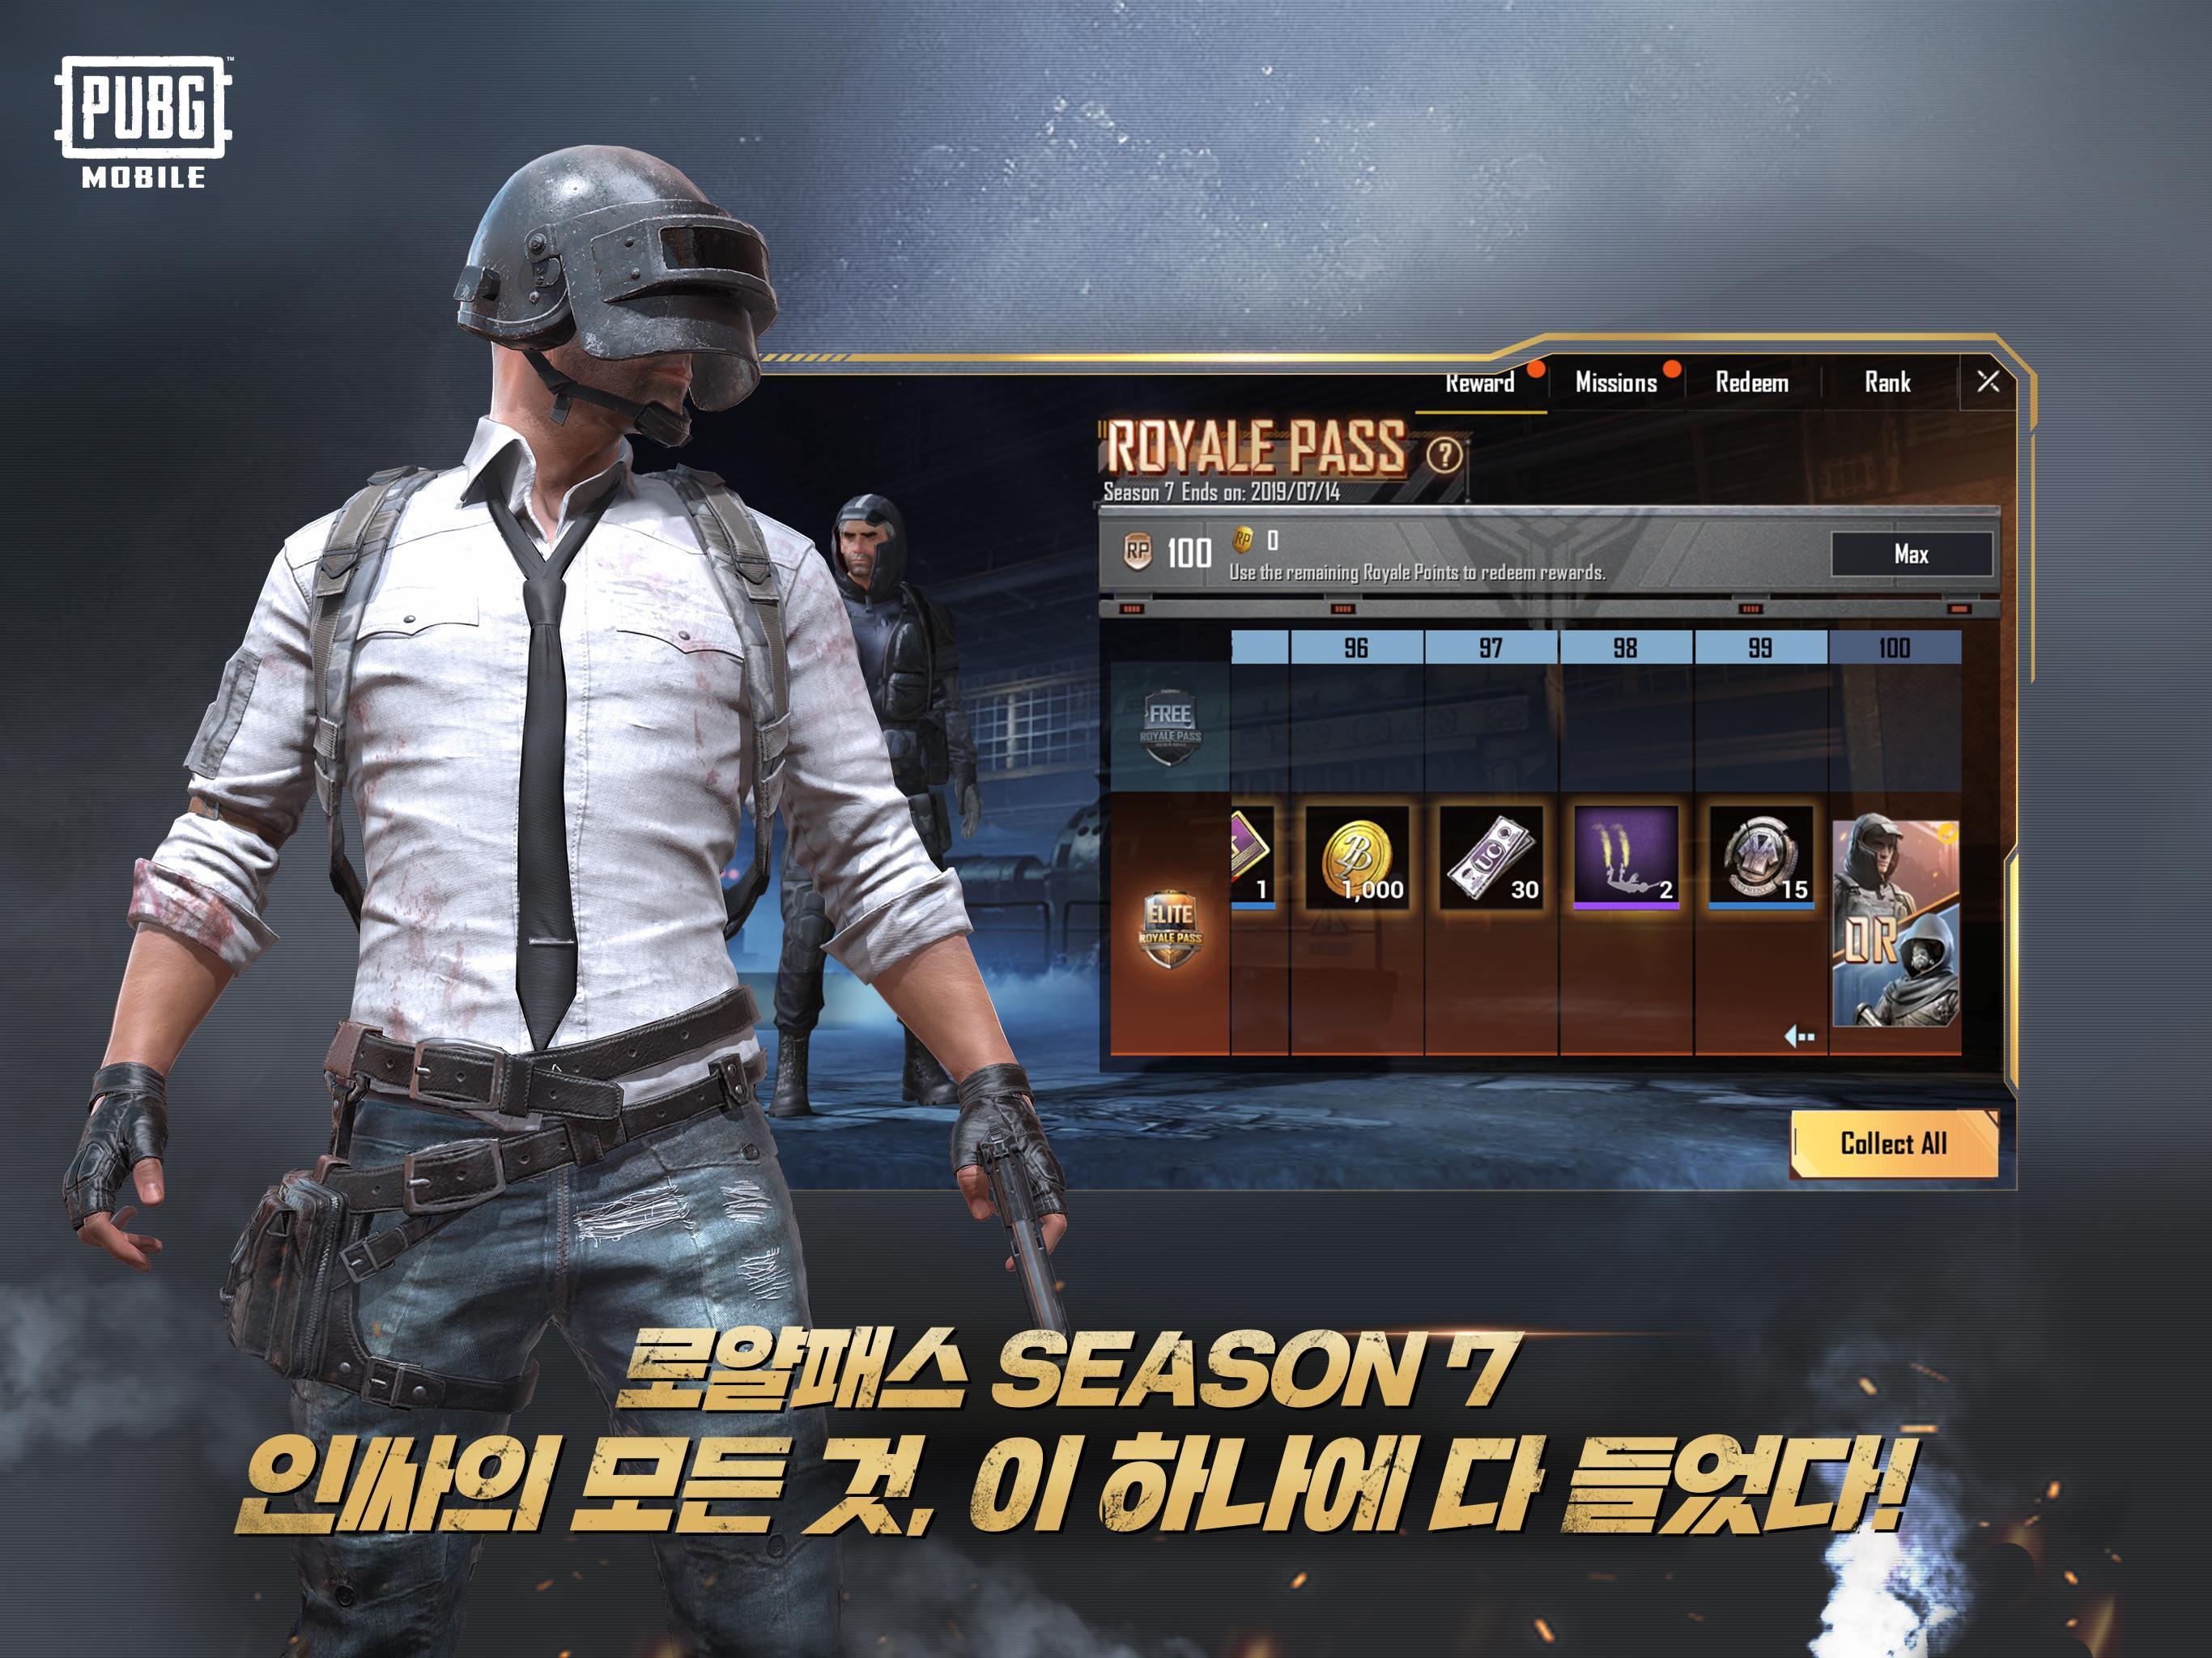 pubg mobile update 0.12 size ios